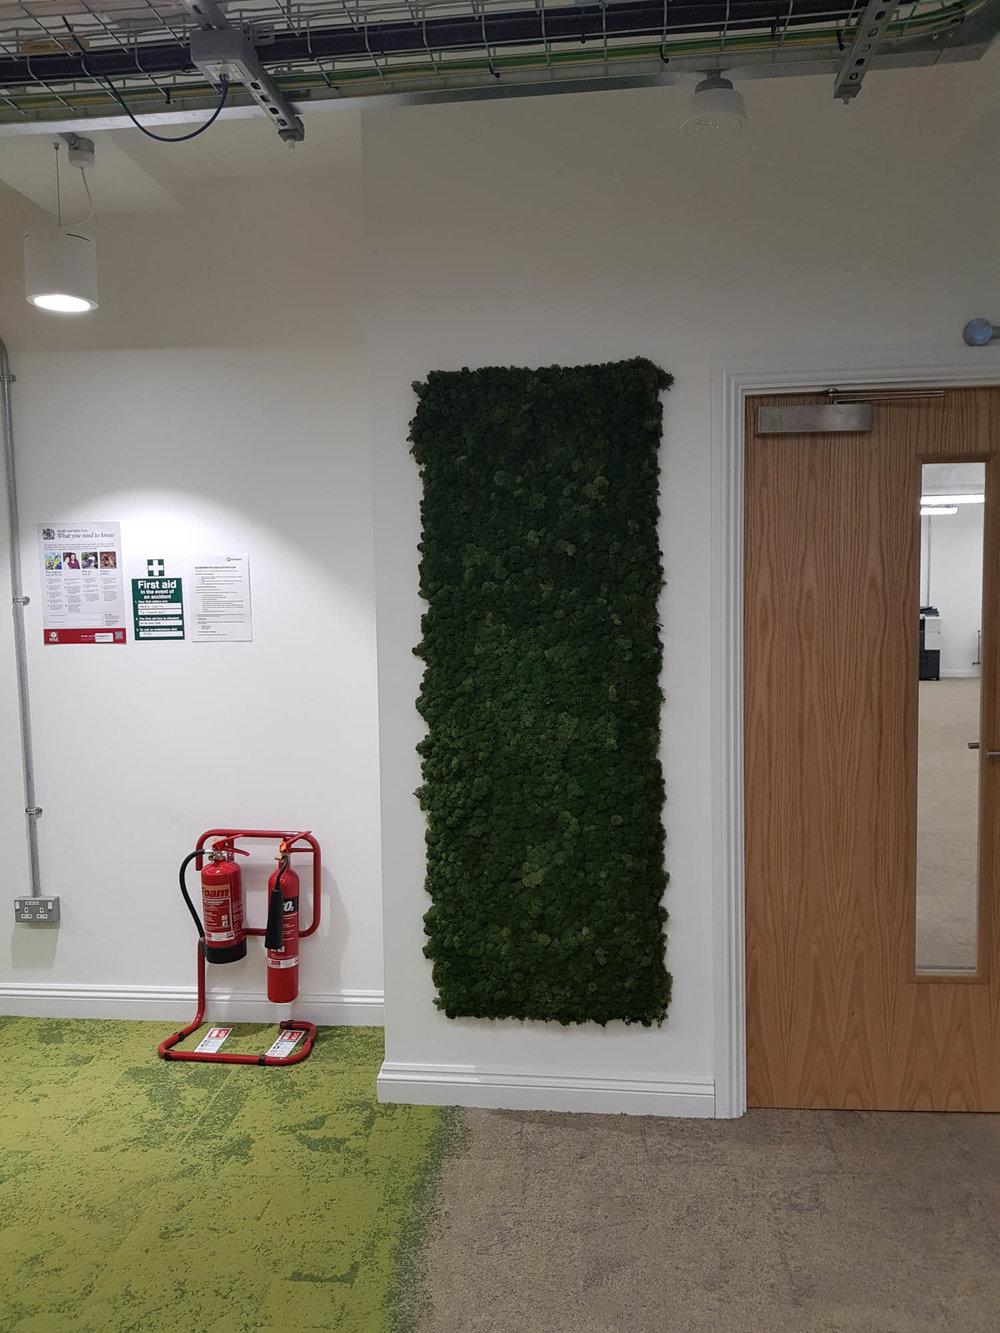 cookpad-interior-plants-mosswalls-branded-planters-plantcare-bristol-image-1